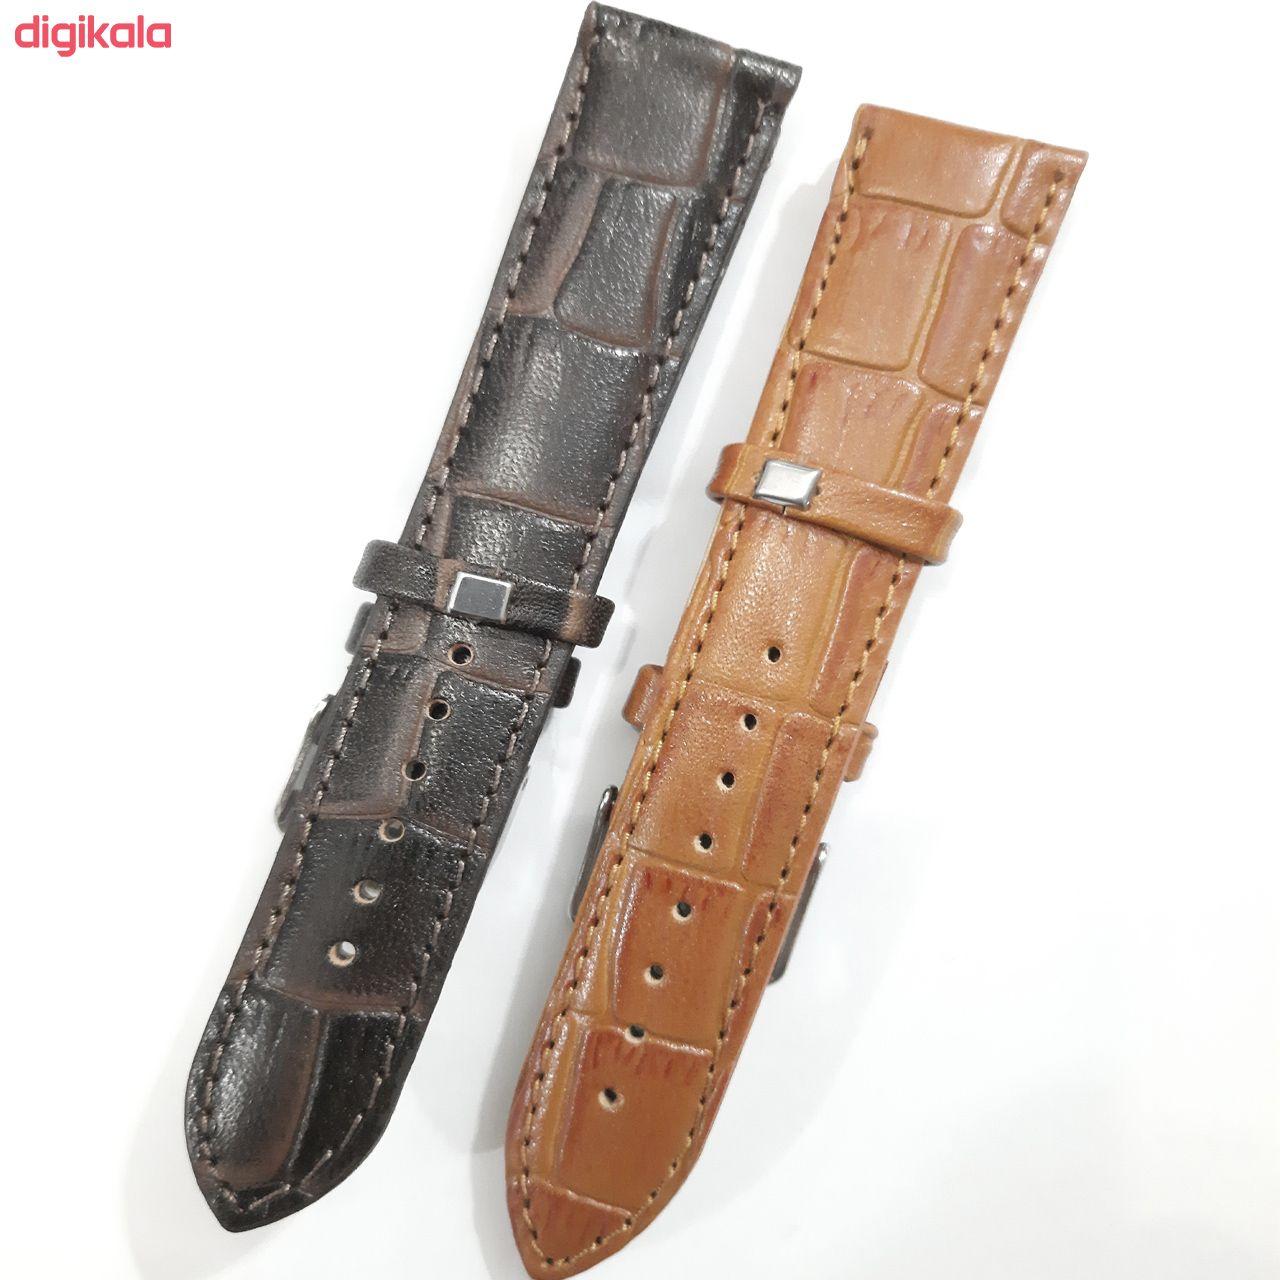 بند مدل WA 01 مناسب برای ساعت هوشمند سامسونگ Gear S2/Gear Sport/ Galaxy Watch 42mm main 1 1